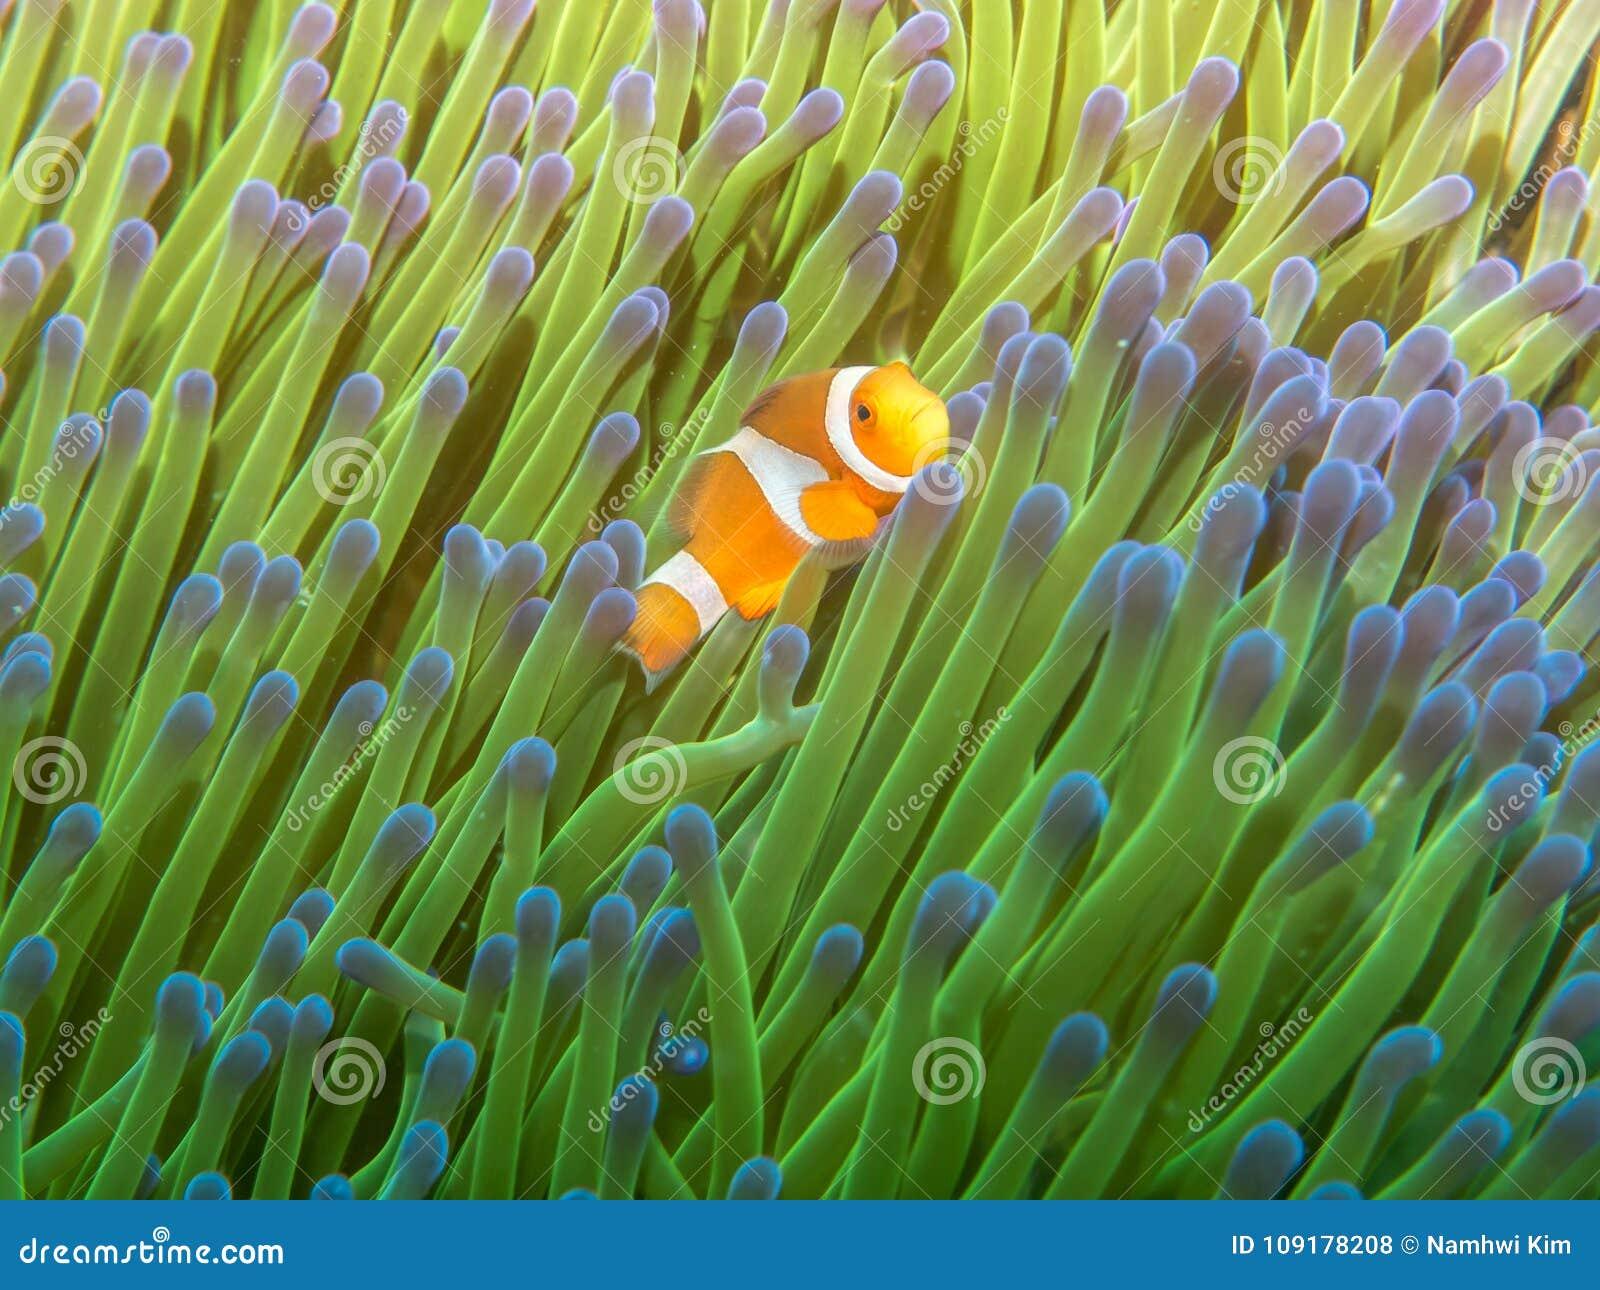 Anemone fish with Sea Anemone